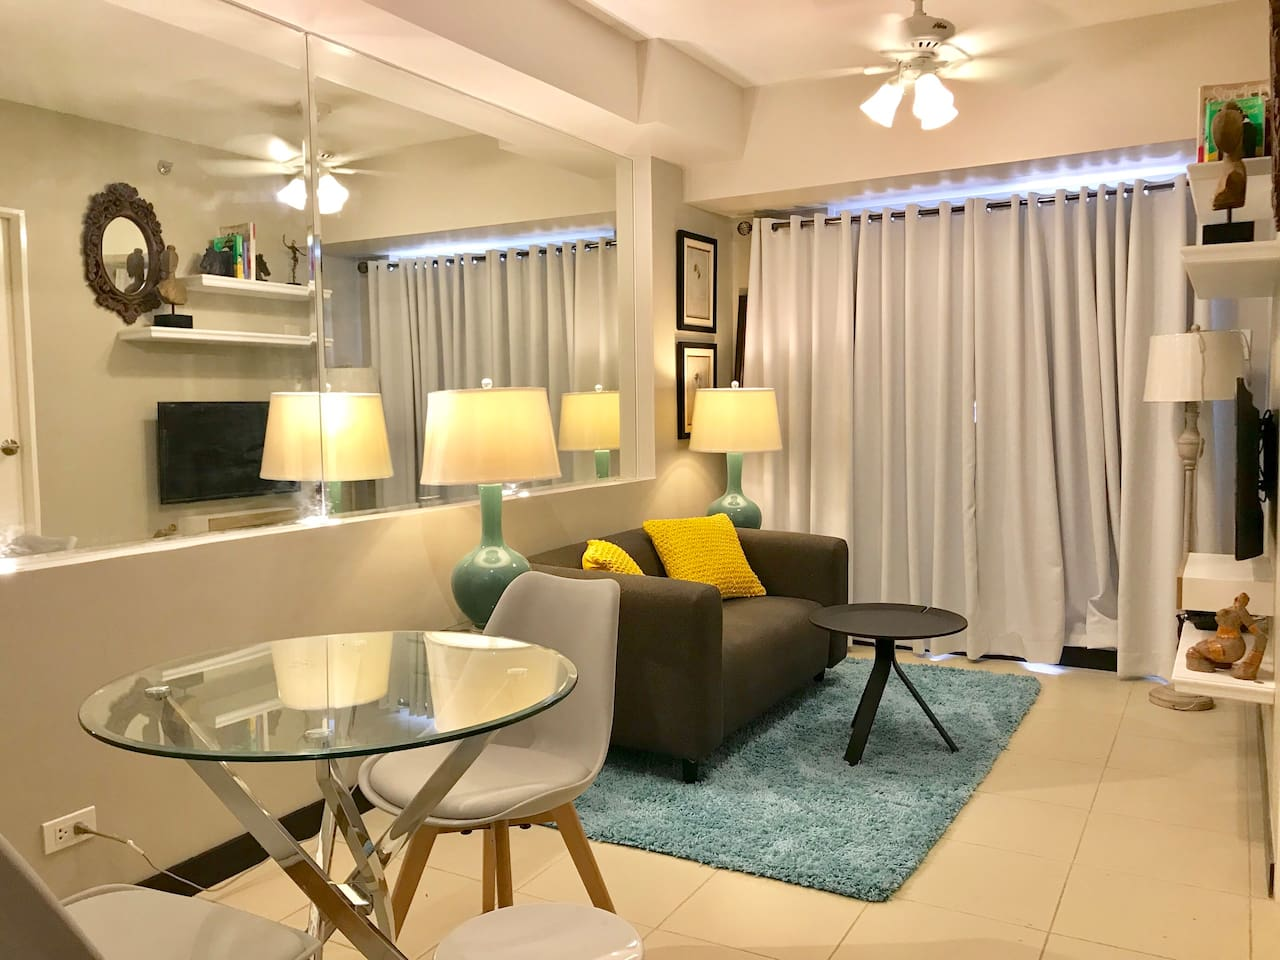 Dinning table for four, 2 seater sofa, coffee table, ceiling fan, flat screen tv, pldt fiber optic wifi tv, balcony  PLDT FIBER INTERNET  CIGNAL HIGH DEFINITION cable tv